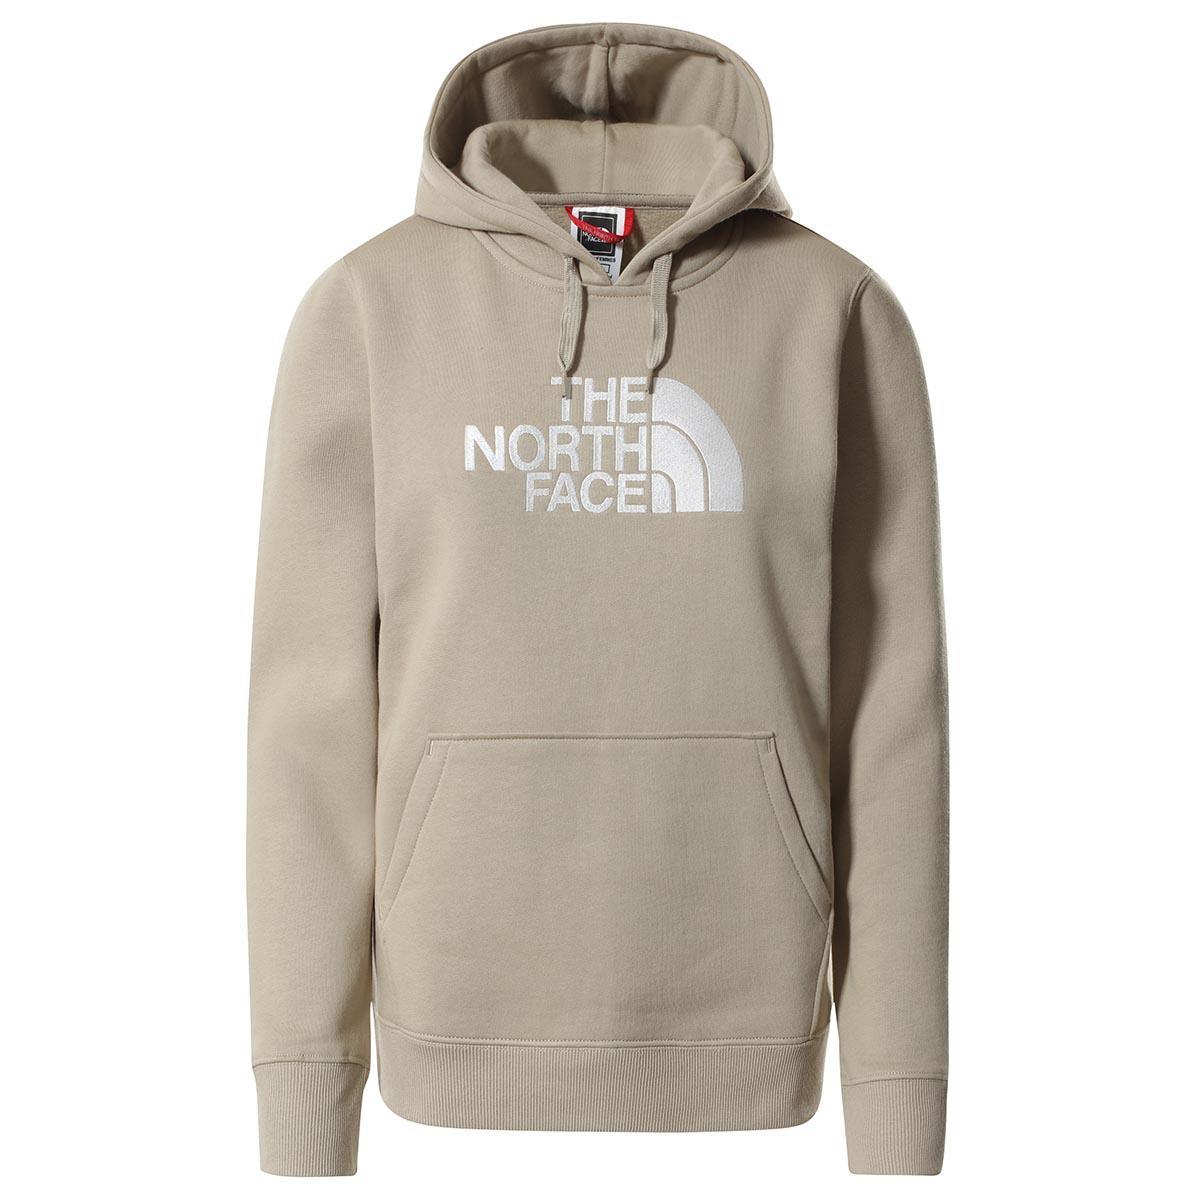 The Northface Kadın  DREW PEAK Swetshirt HD NF0A55ECCEL1